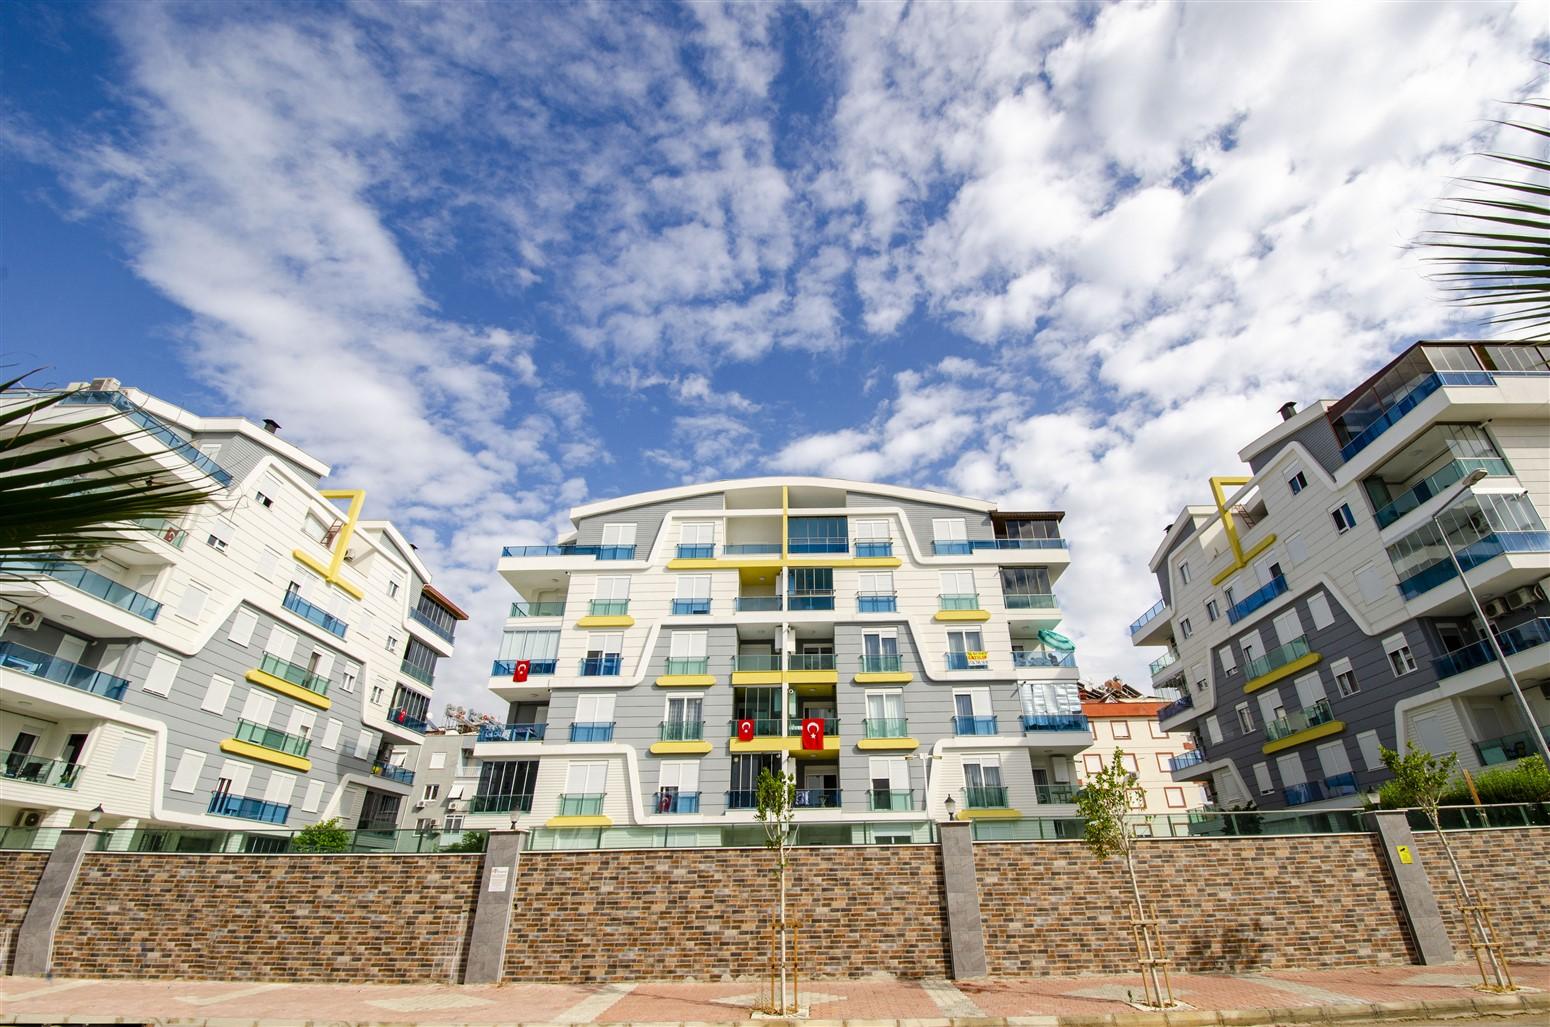 Трёхкомнатная квартира в микрорайоне Лиман - Фото 2